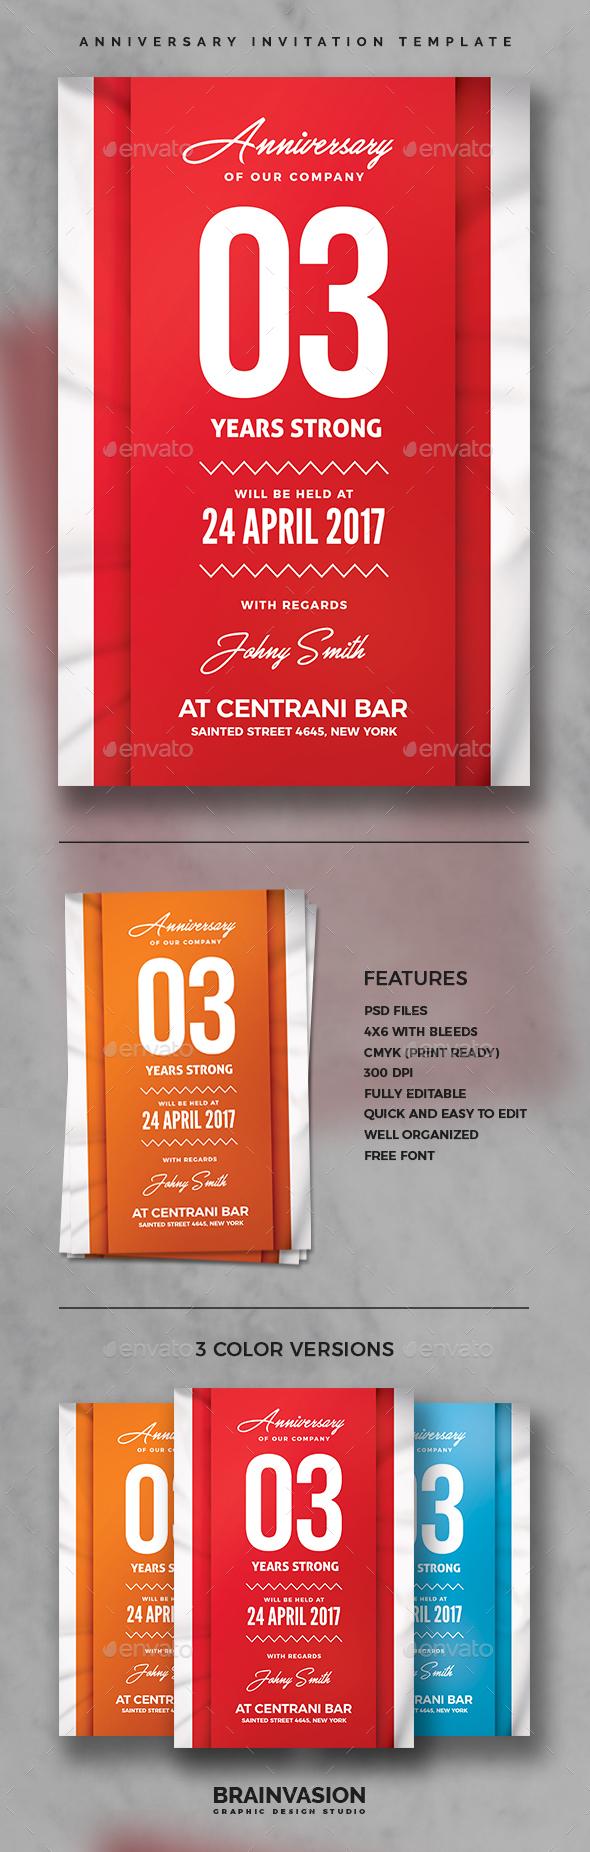 Anniversary Invitation Template - Anniversary Greeting Cards